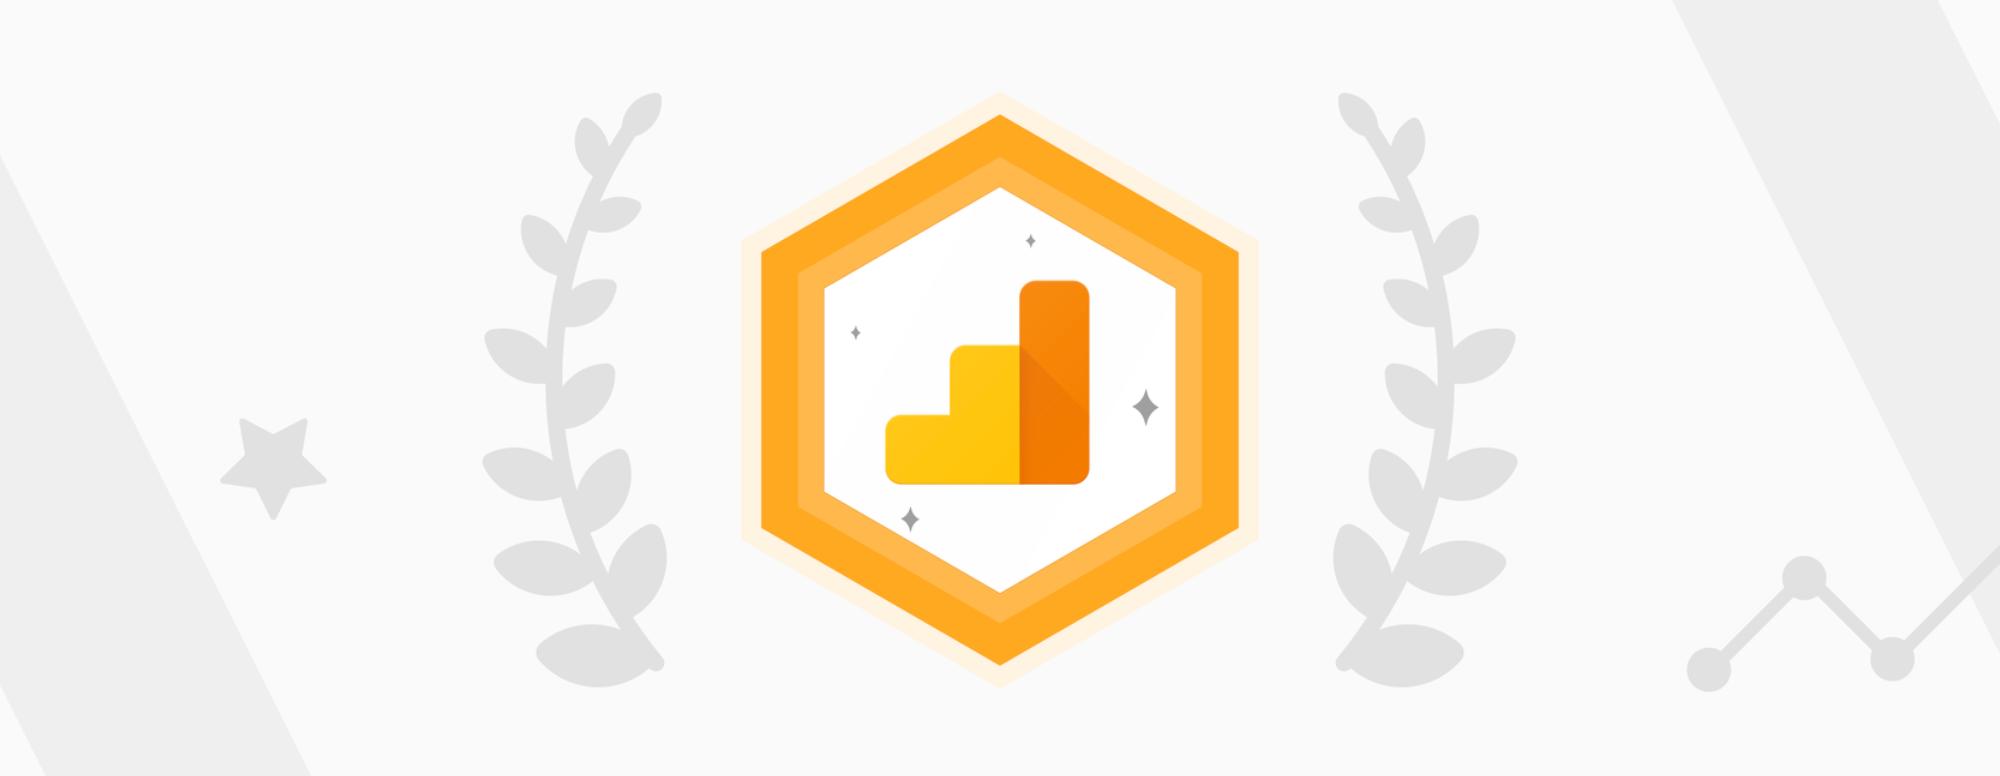 Google Analytics Certification Sfdcfanboy